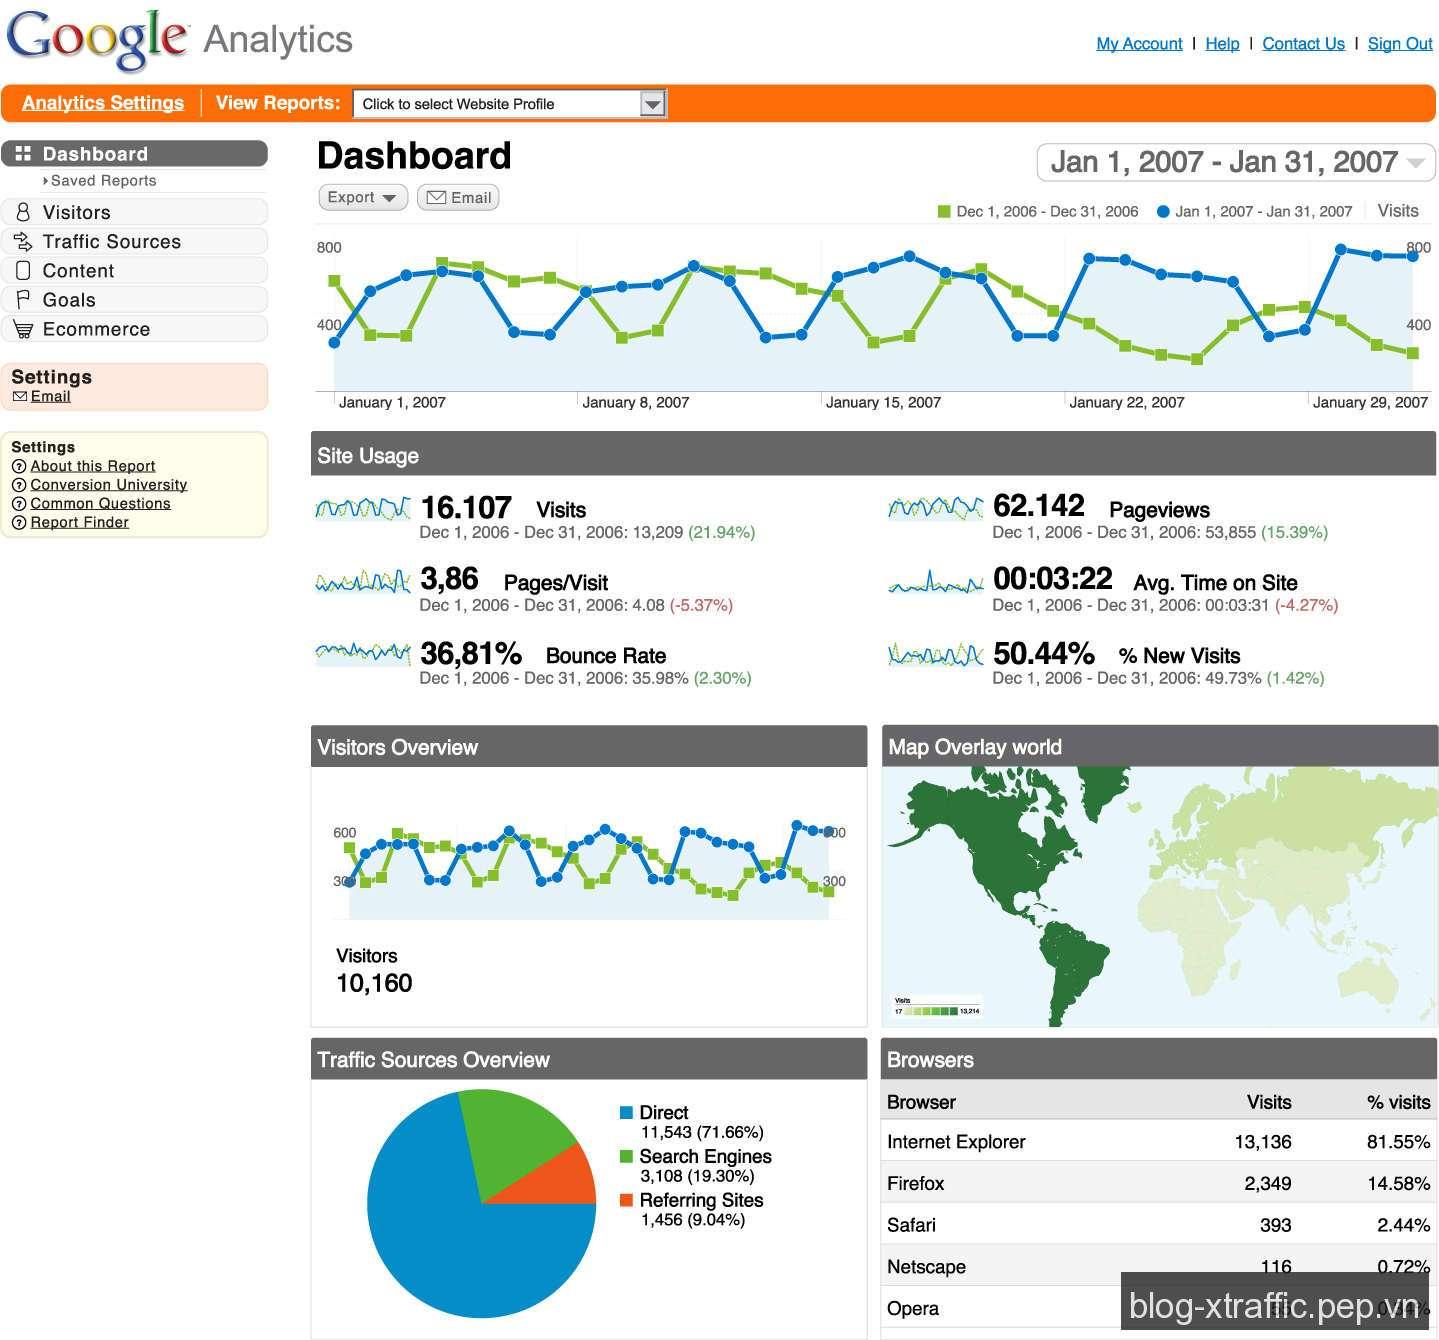 Phần mềm phân tích & thống kê website trong SEO - AWStats Clicktale Clicky Web Analytics Google Analytics Omniture phân tích website Piwik Open Source Analysis Sawmill Analytics thống kê website Unica NetInsight Woopra Website Tracking - Digital Marketing